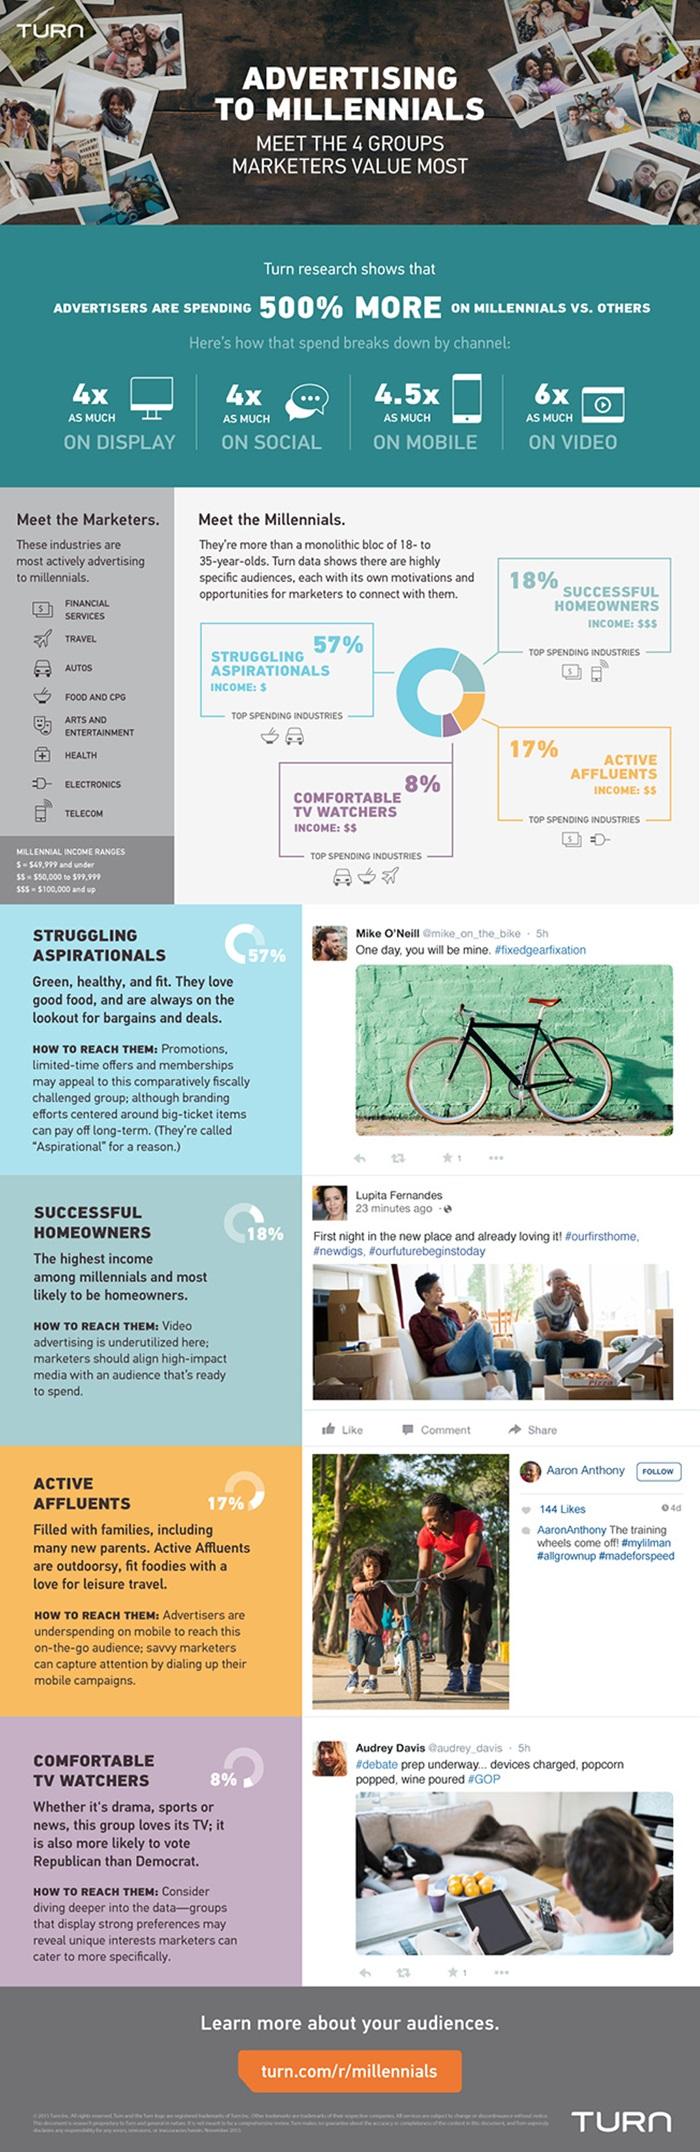 Turn-Millennial-Report-01-2015